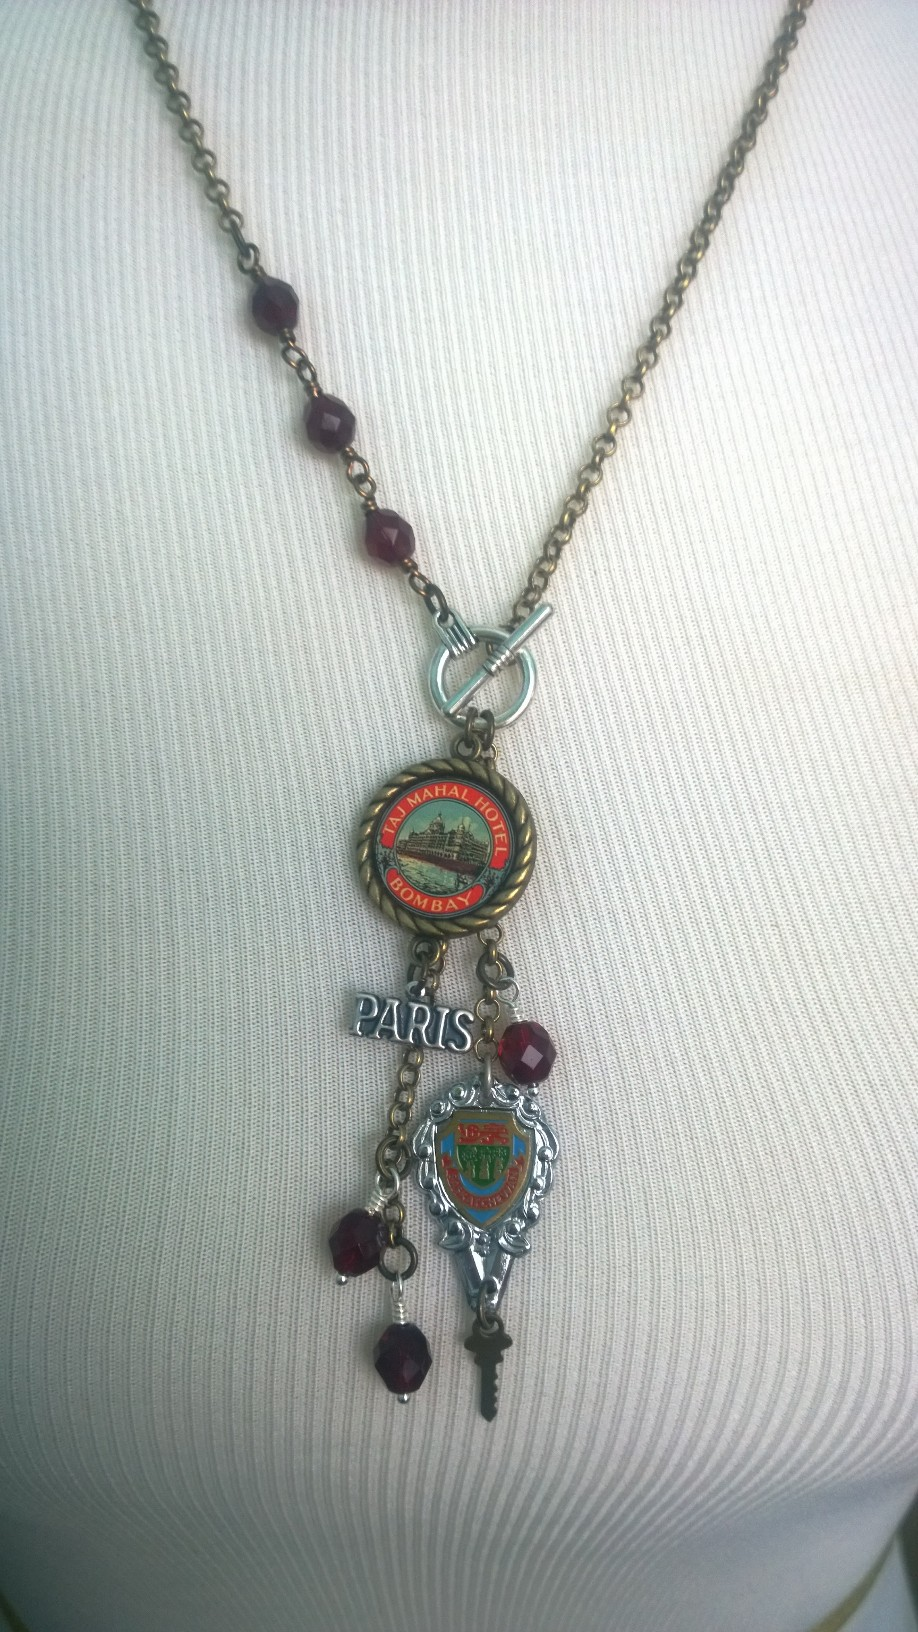 Travel tassel necklace